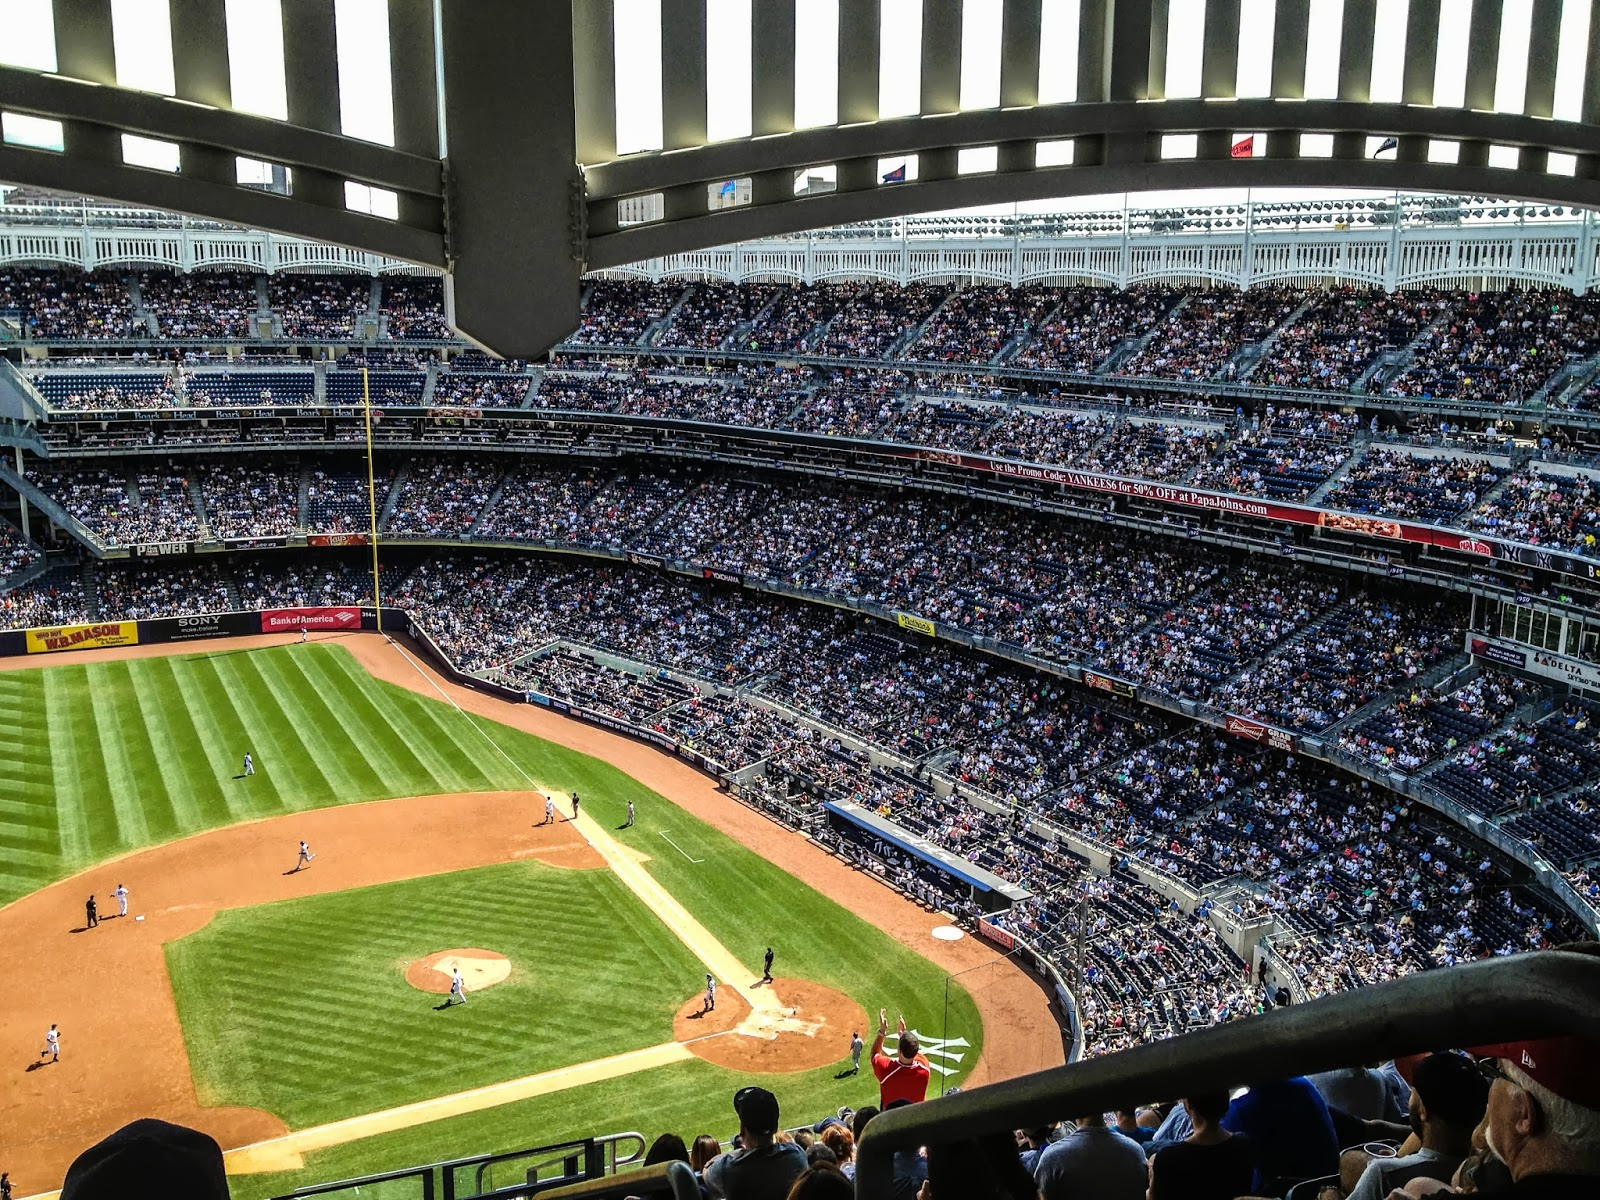 yankees vs red socks, yankees game, yankees stadium, new york yankees, yankee hotdog, ball game